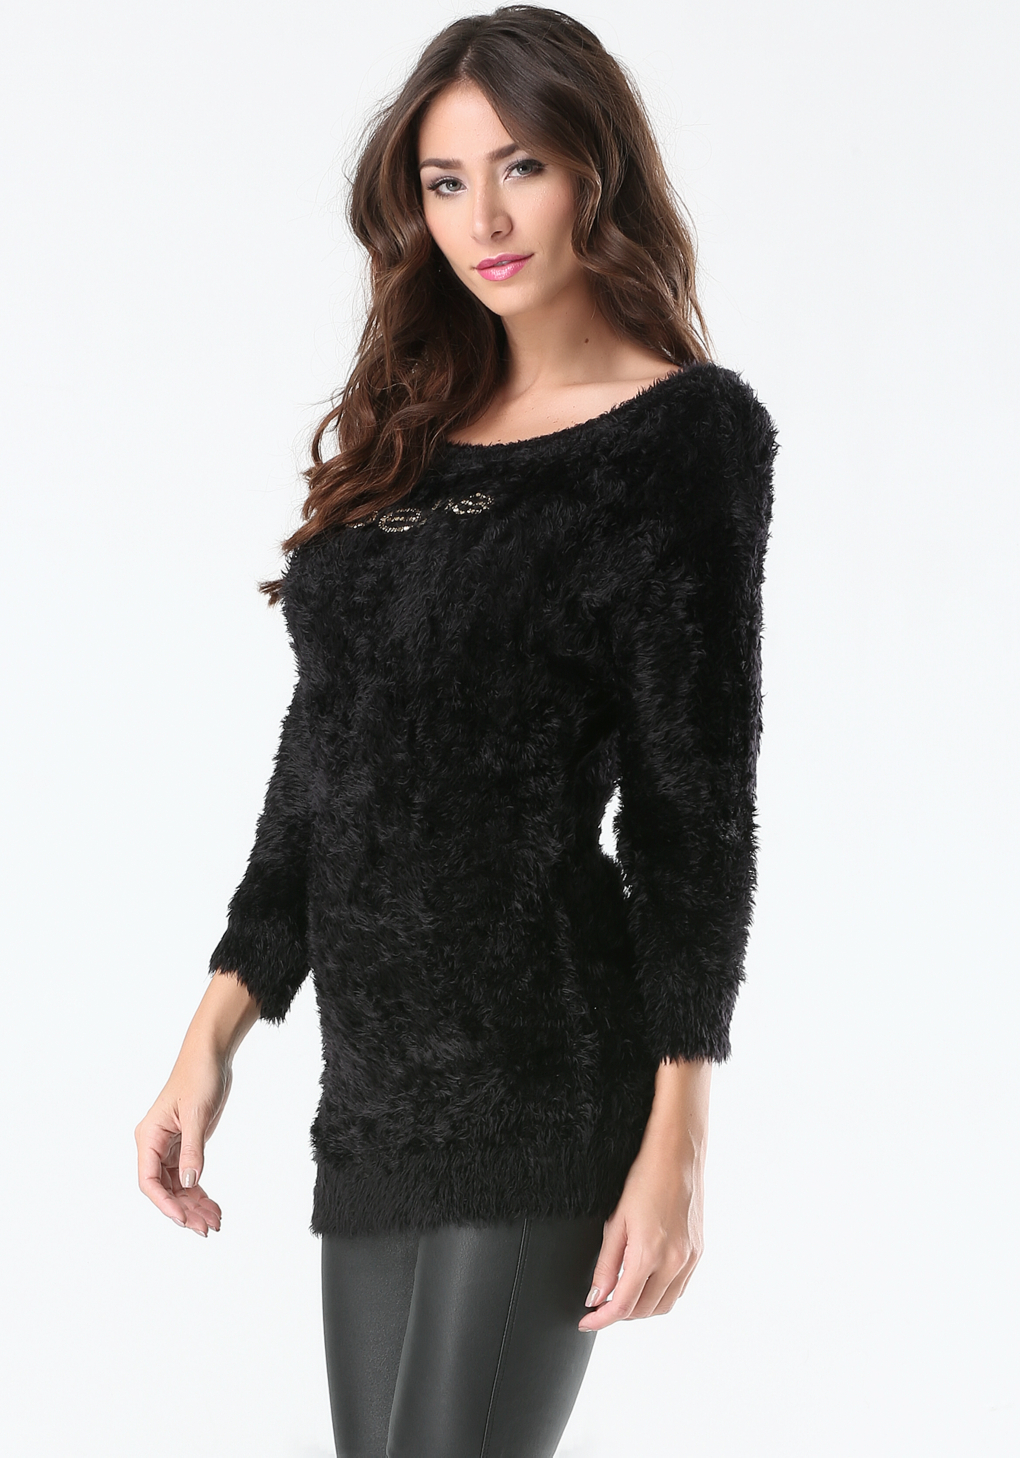 fbedcc2135 Lyst, Bebe Logo Eyelash Sweater in Black